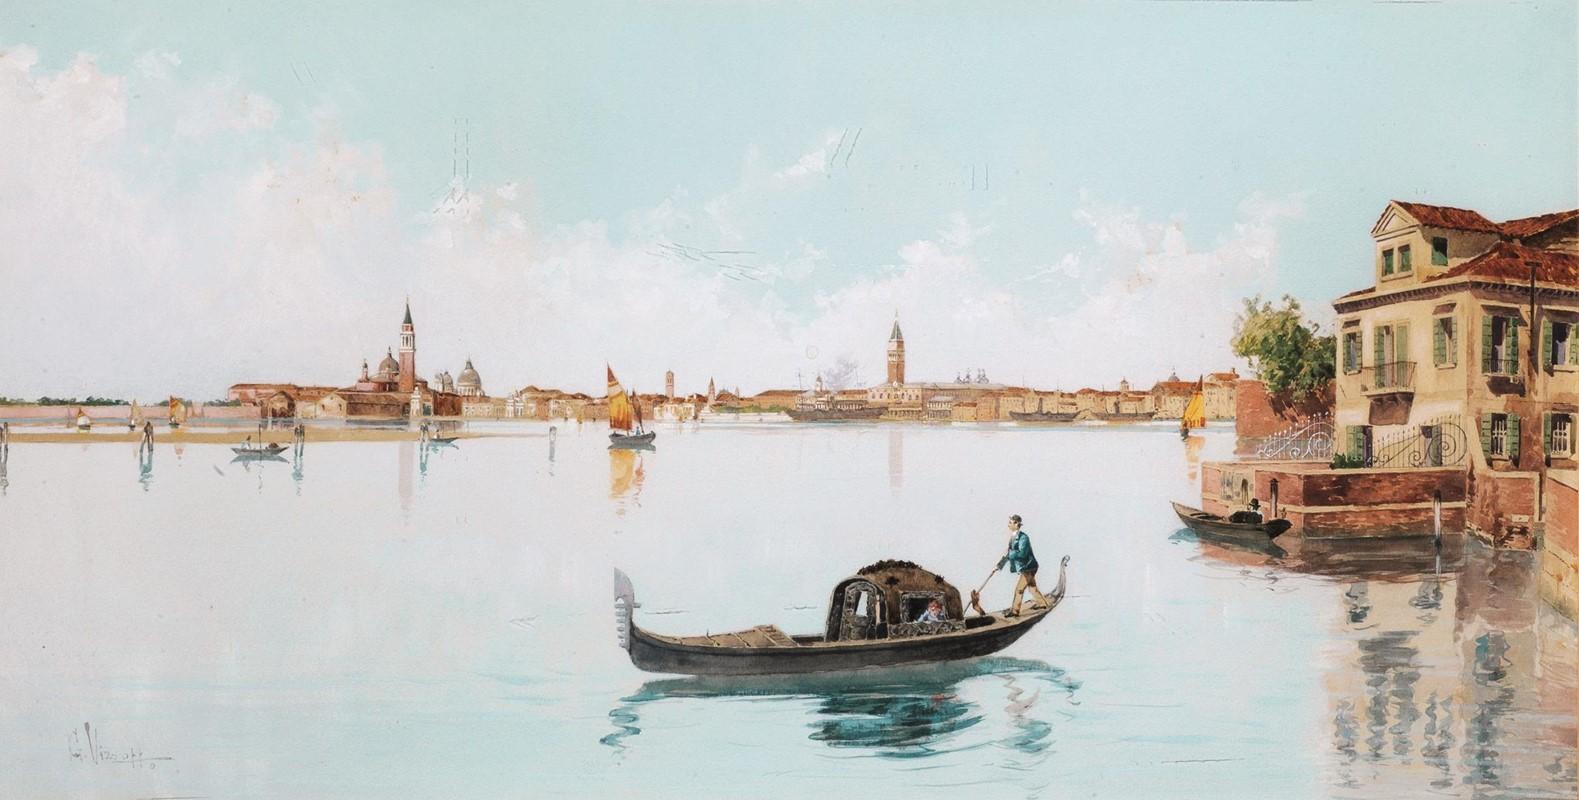 Giuseppe Vizzotto Alberti, Gondola in laguna